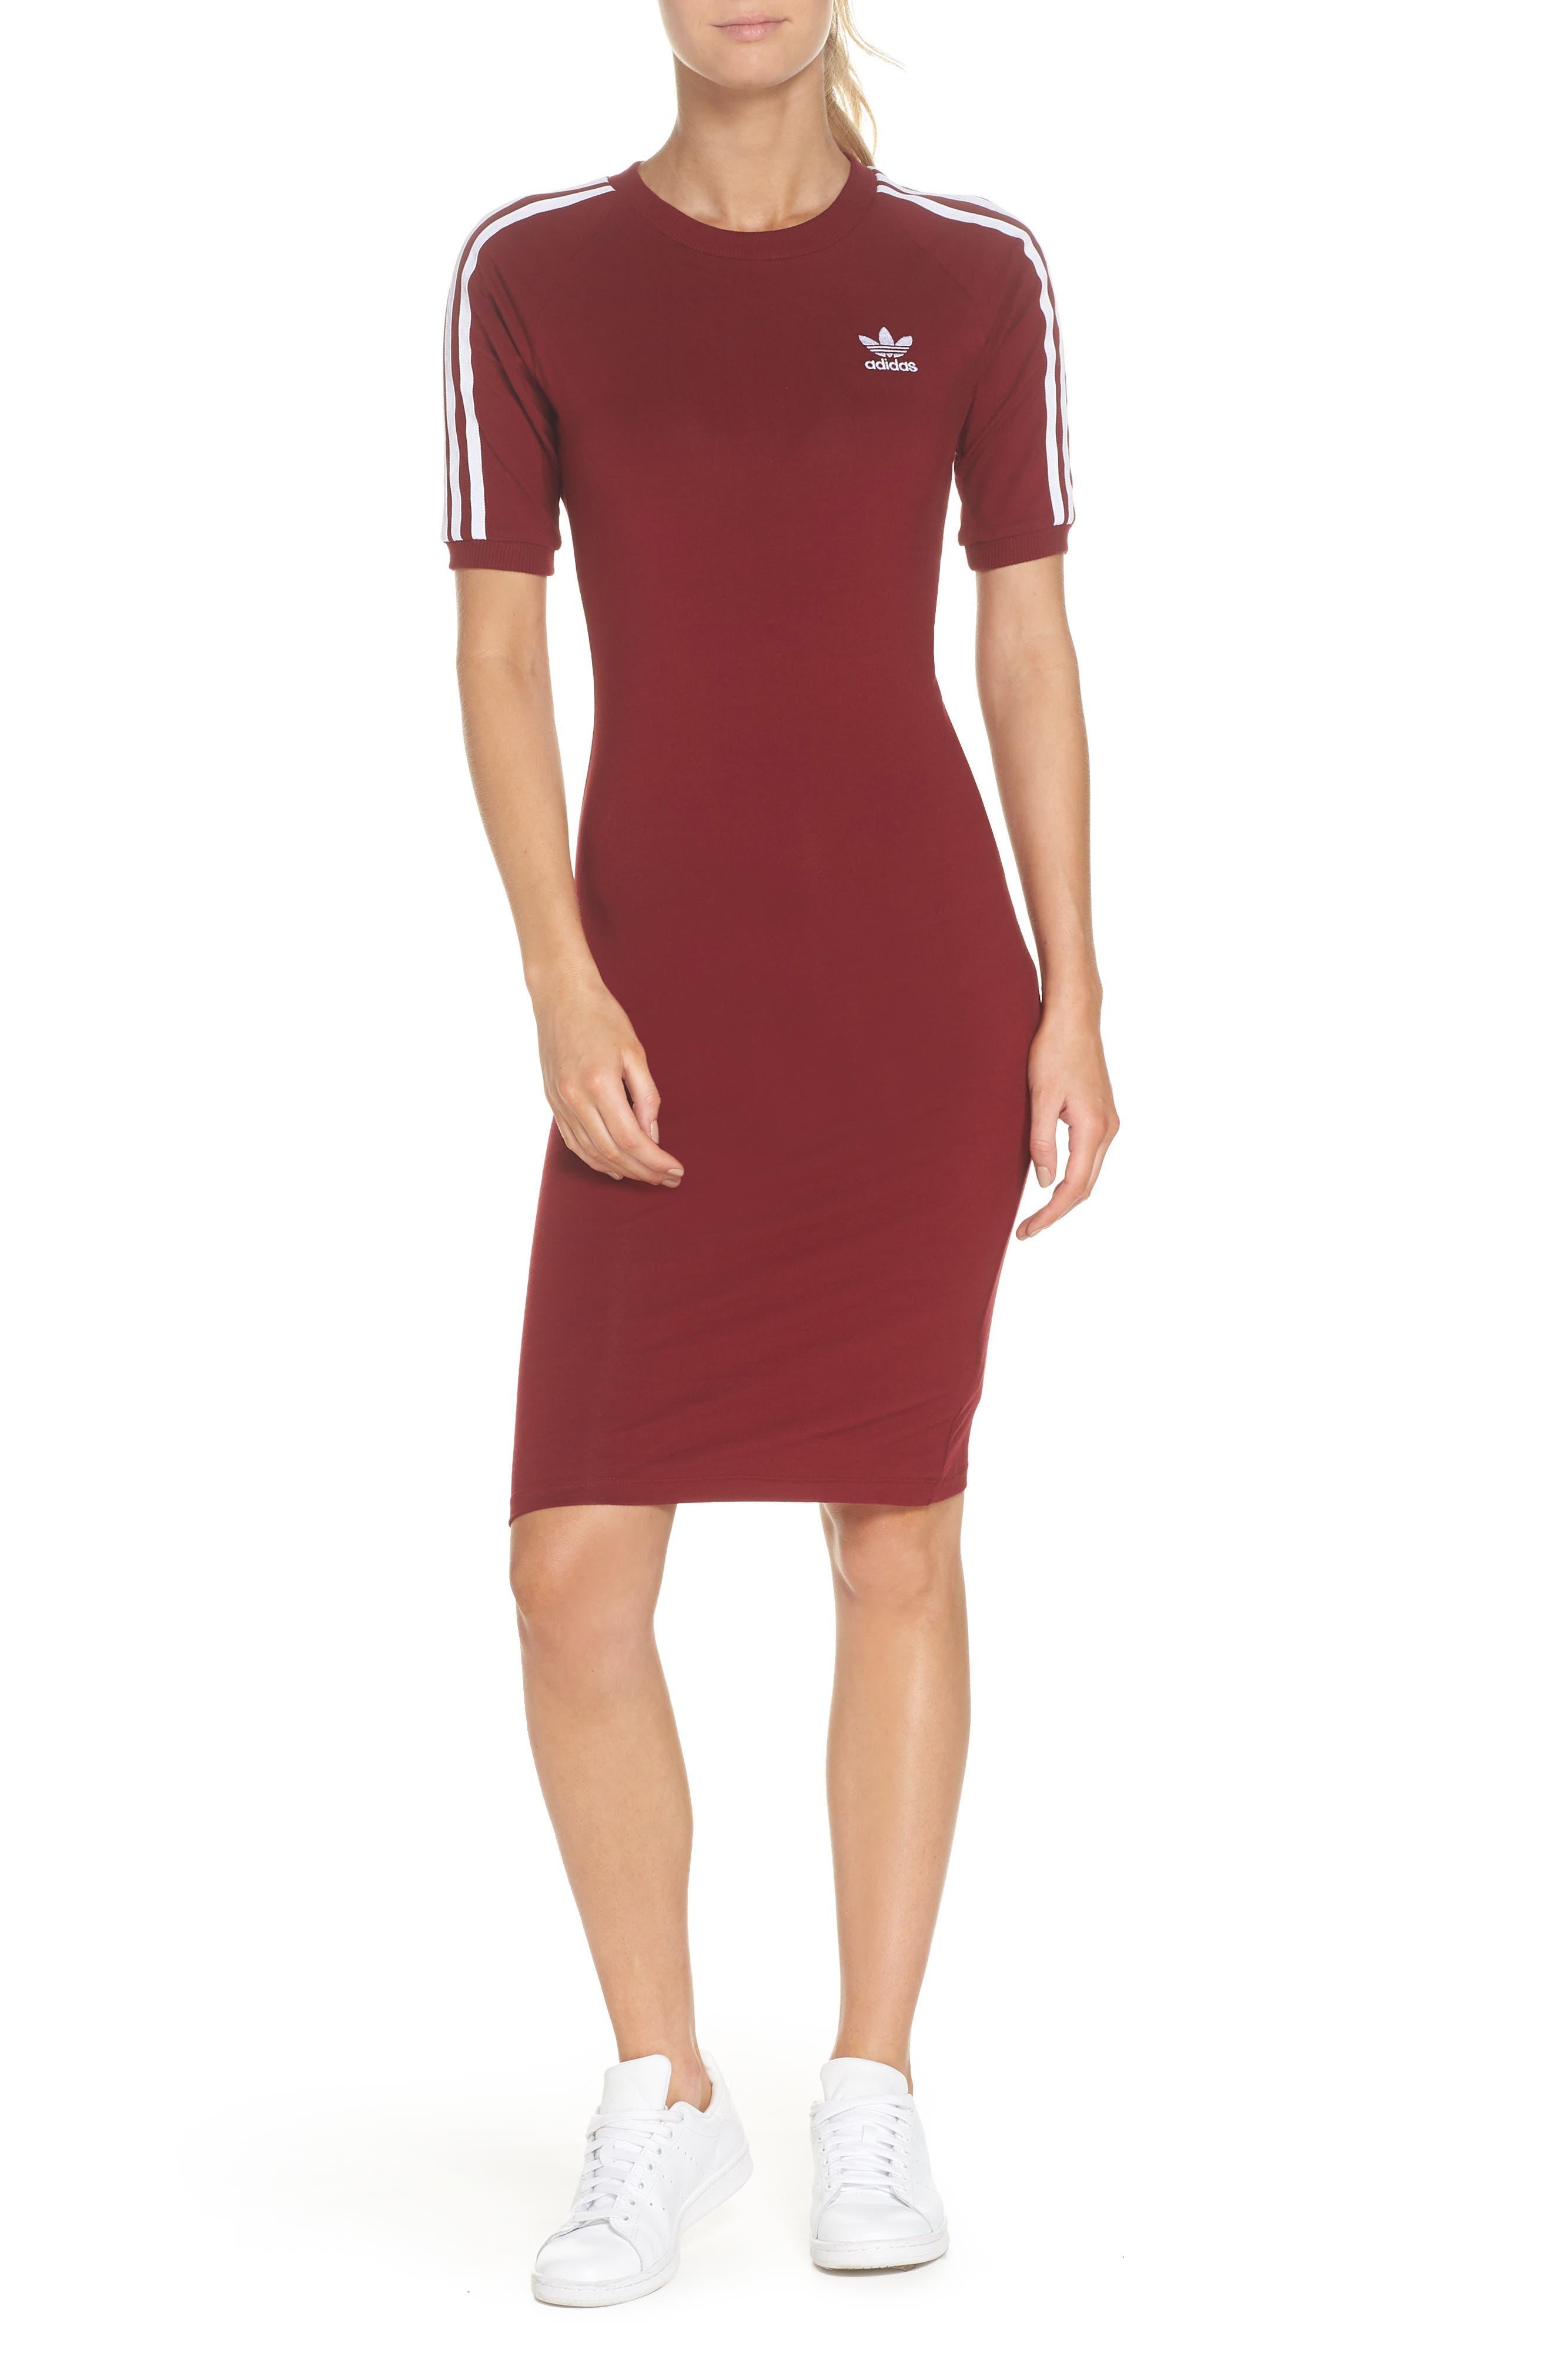 Originals 3-Stripes Dress,                             Main thumbnail 1, color,                             Collegiate Burgundy